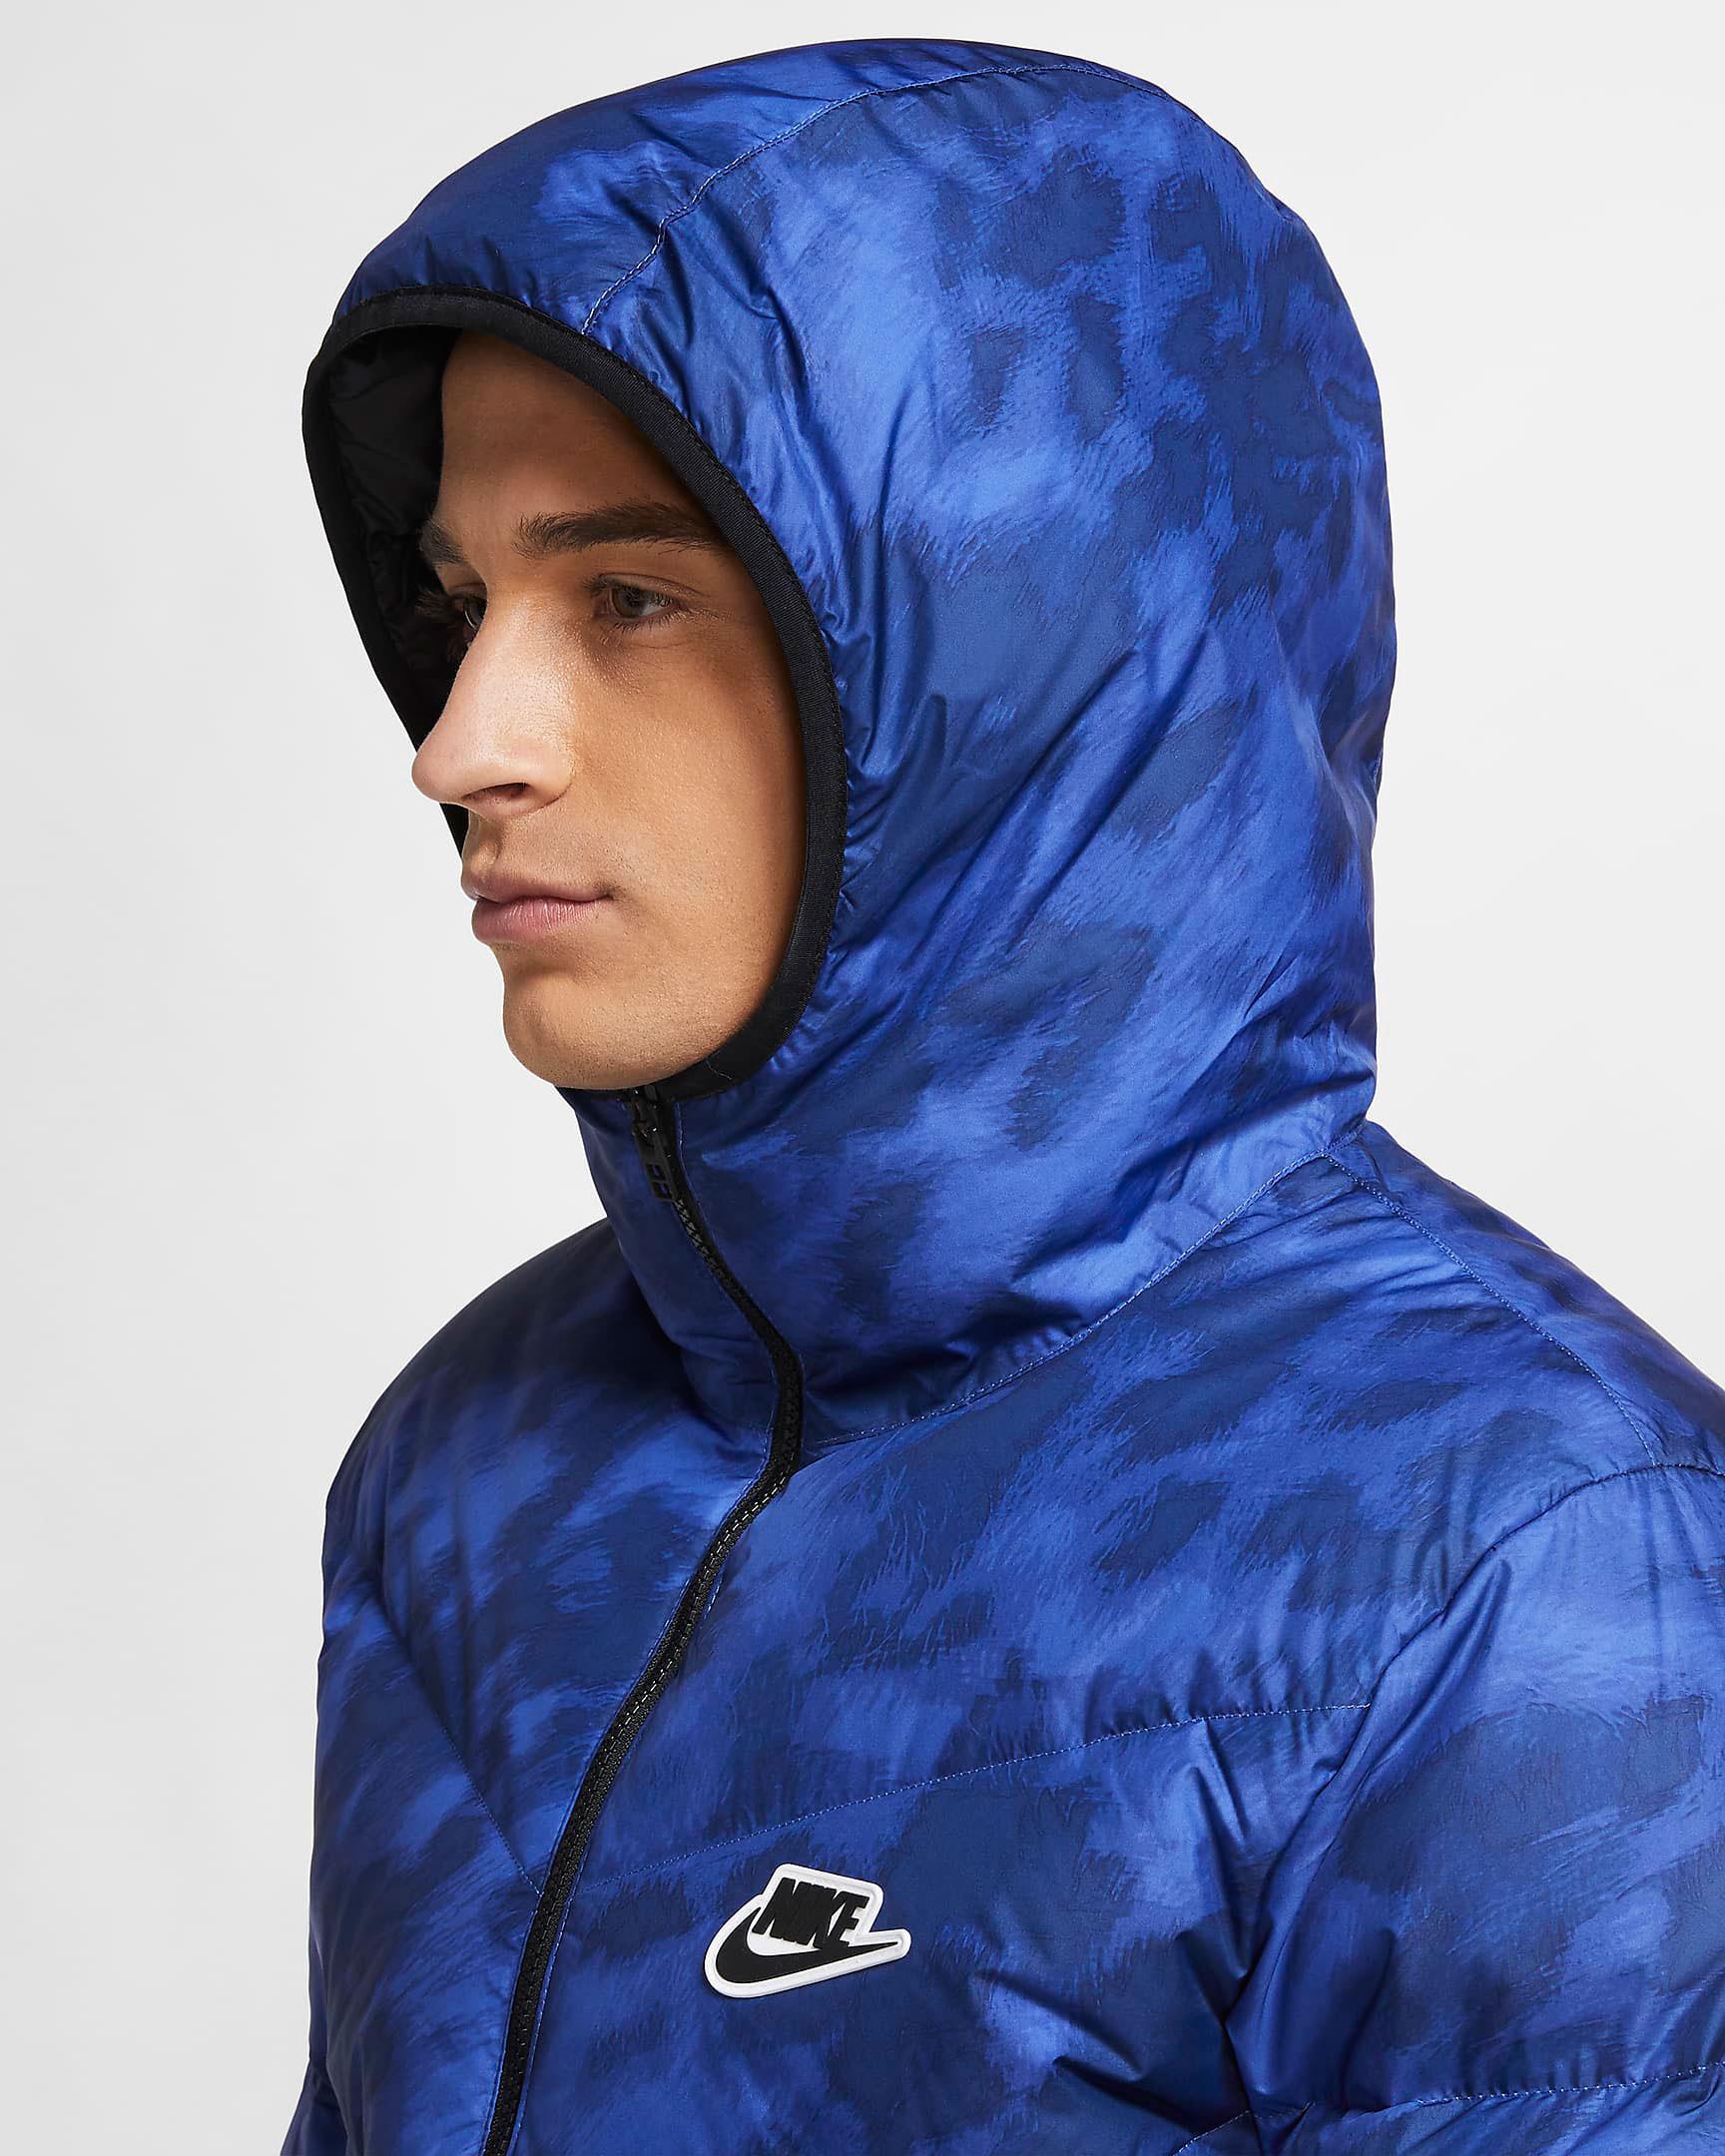 jordan-13-hyper-royal-black-nike-winter-jacket-4